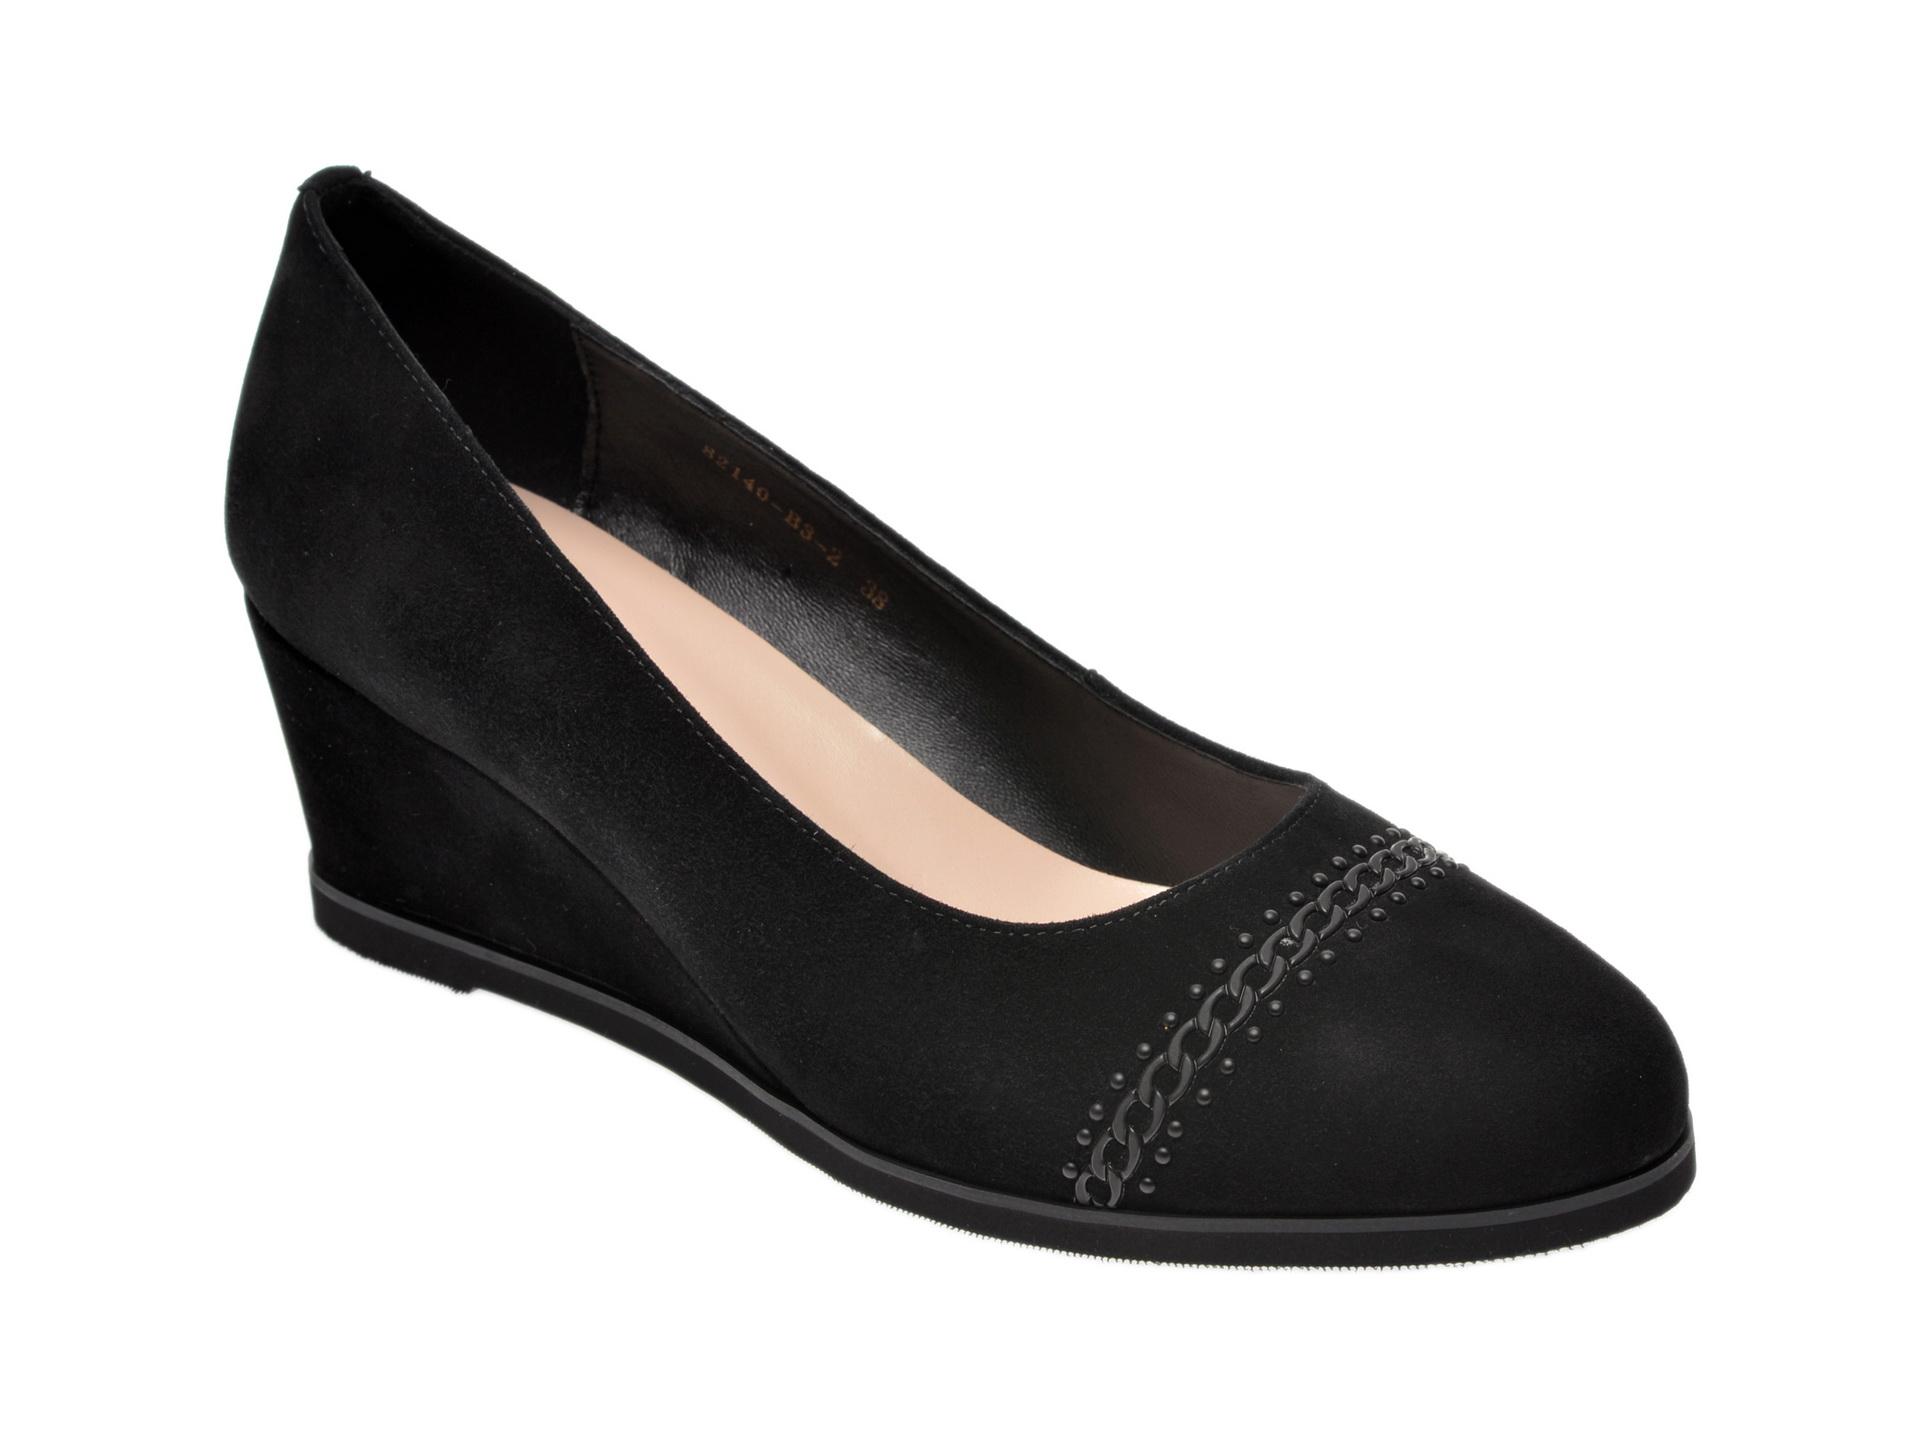 Pantofi IMAGE negri, 82140B3, din piele intoarsa imagine